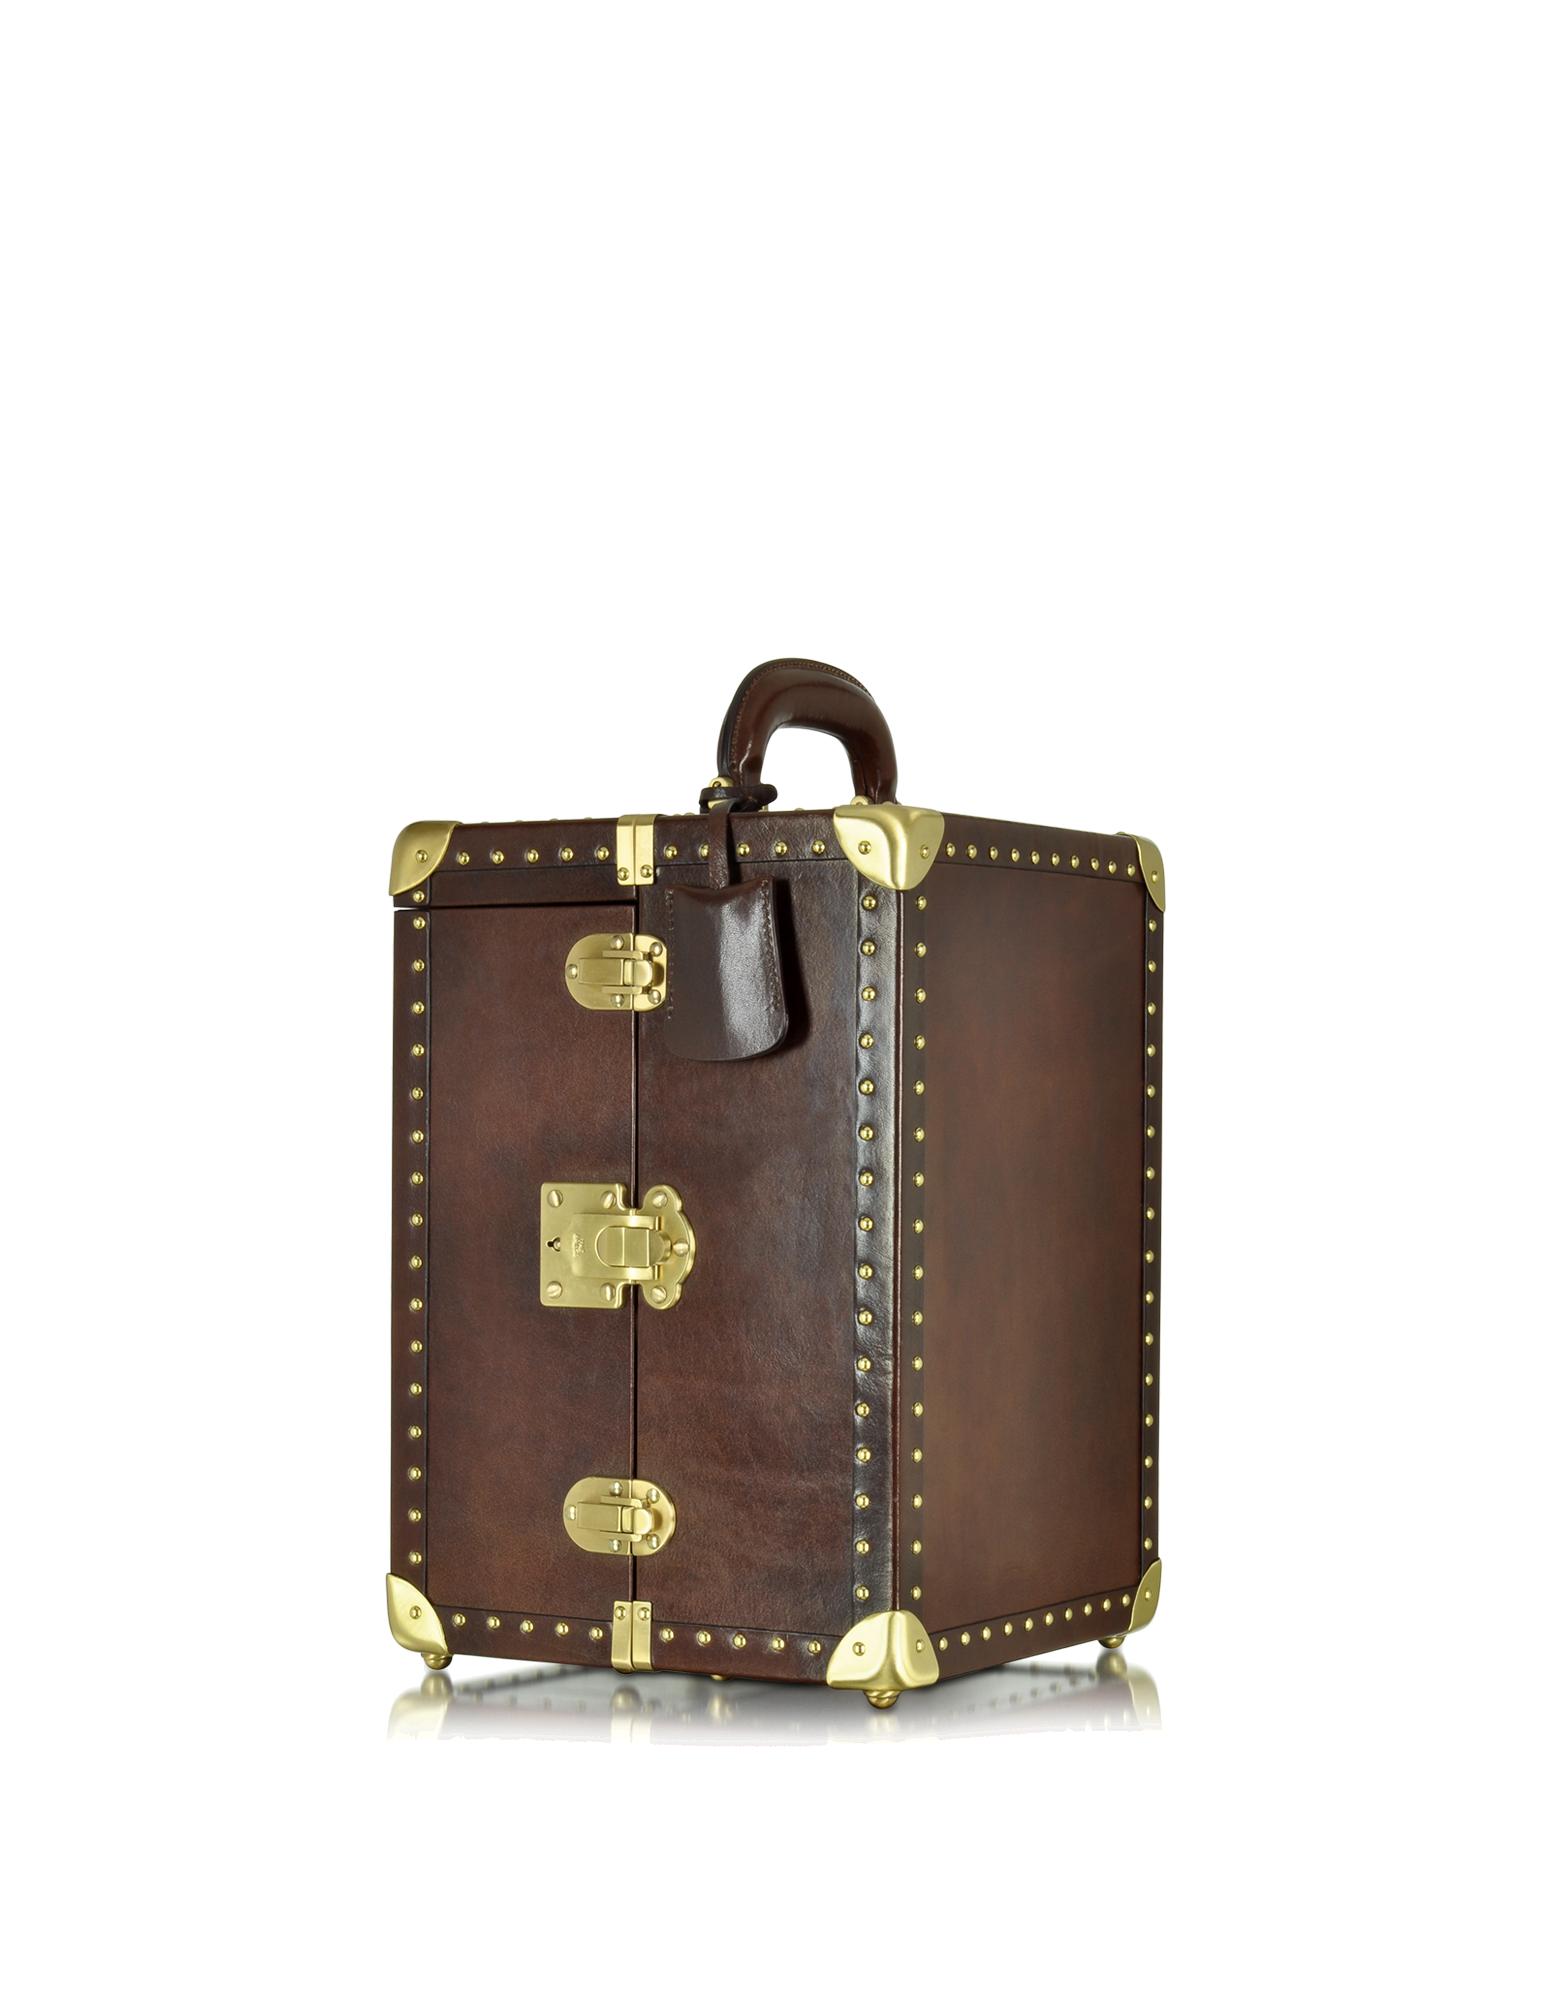 Image of Dark Brown Leather Jewelry Box